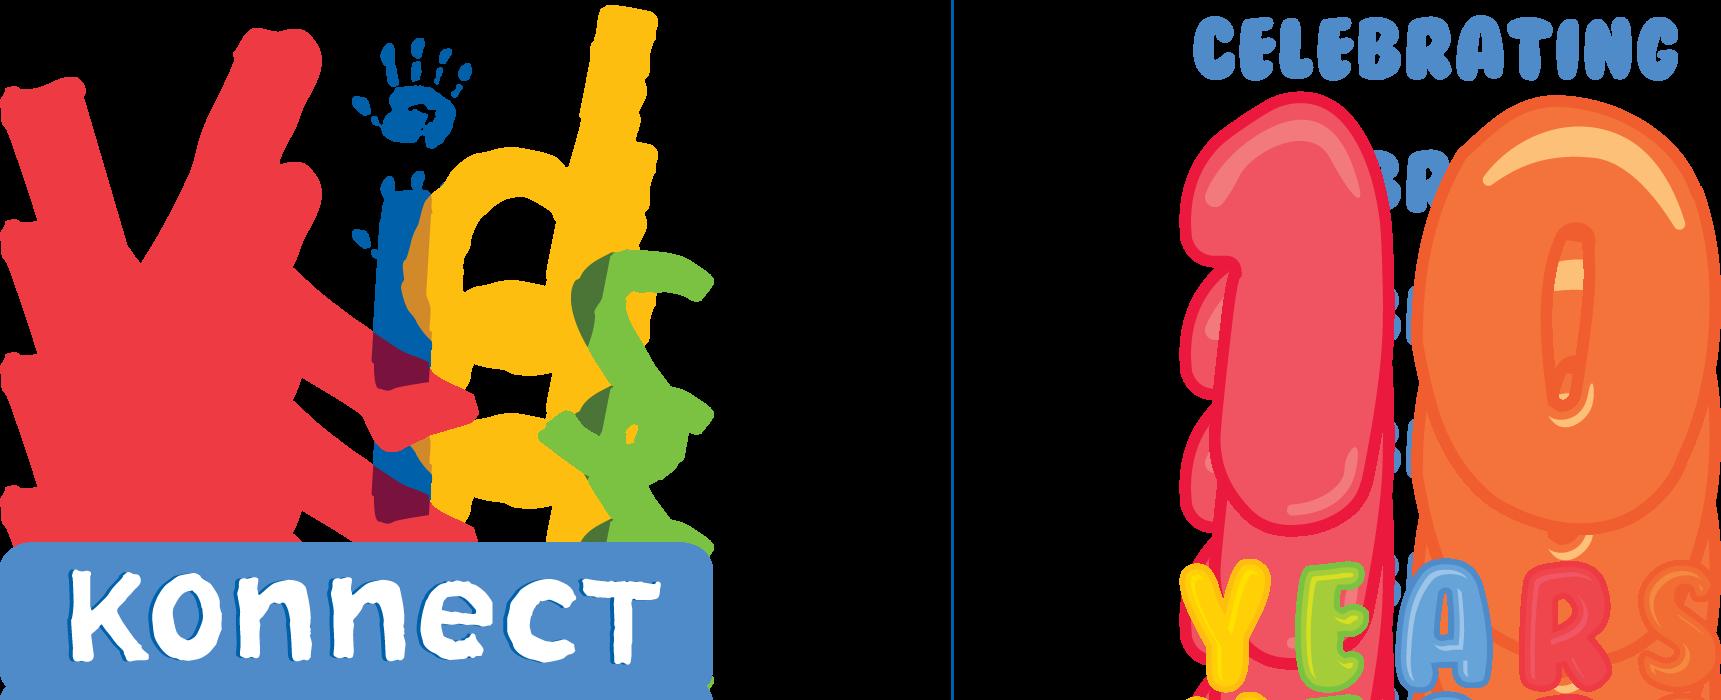 Kids Konnect is 10